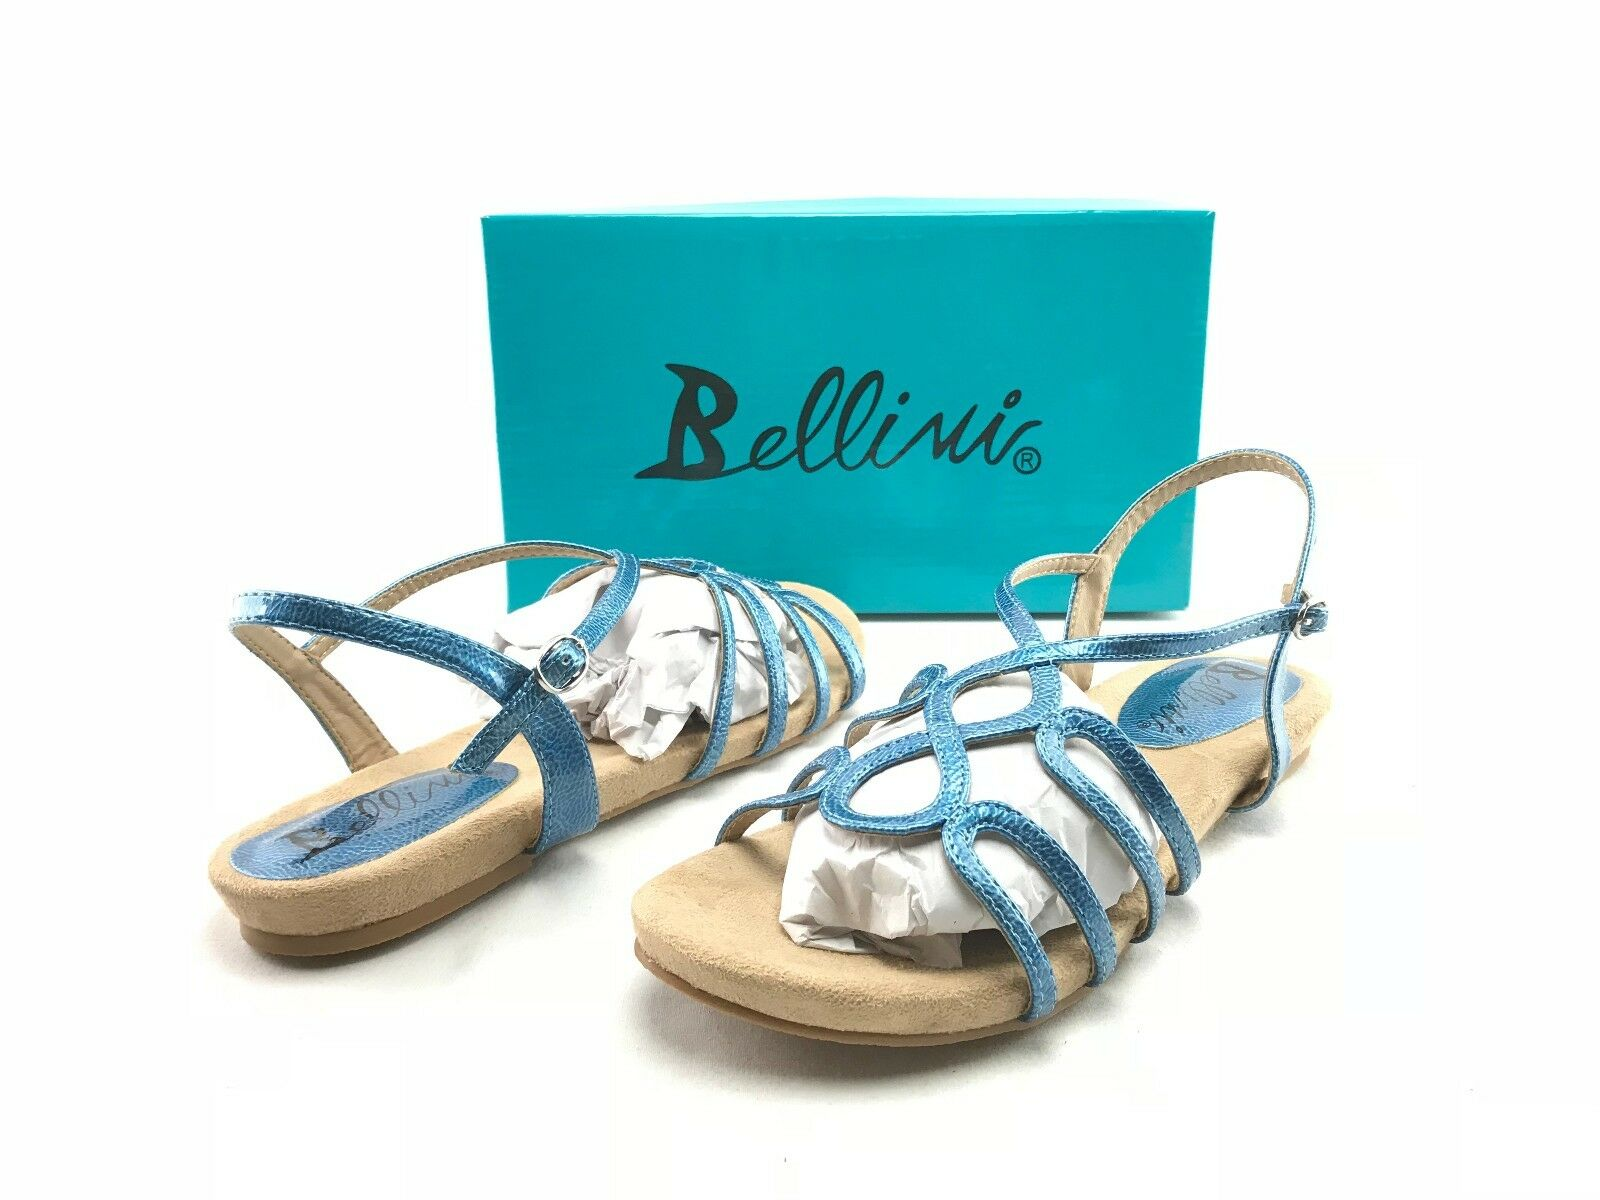 NEW Bellini US Nadine Women's Blue Strappy Fashion Casual Sandals US Bellini 8.5 Shoes B212 144074